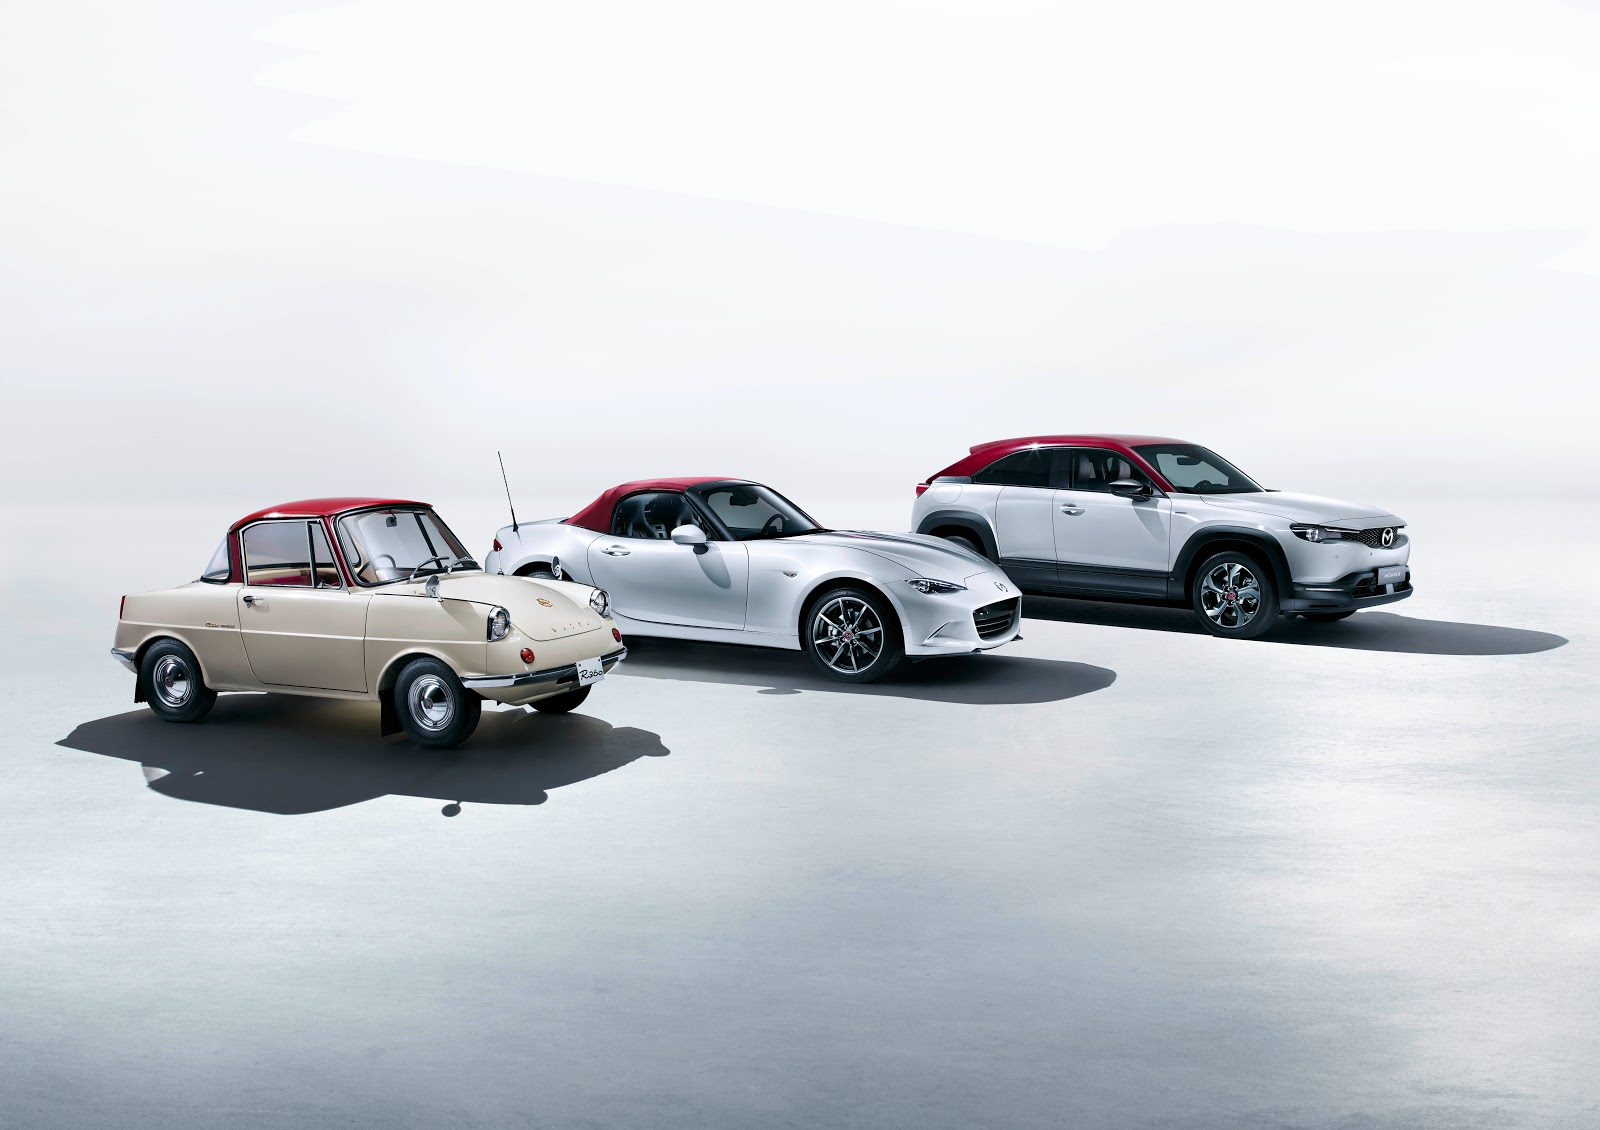 M60 Mazda Range rgb hires 60 χρόνια εμβληματικών coupe απο τη Mazda